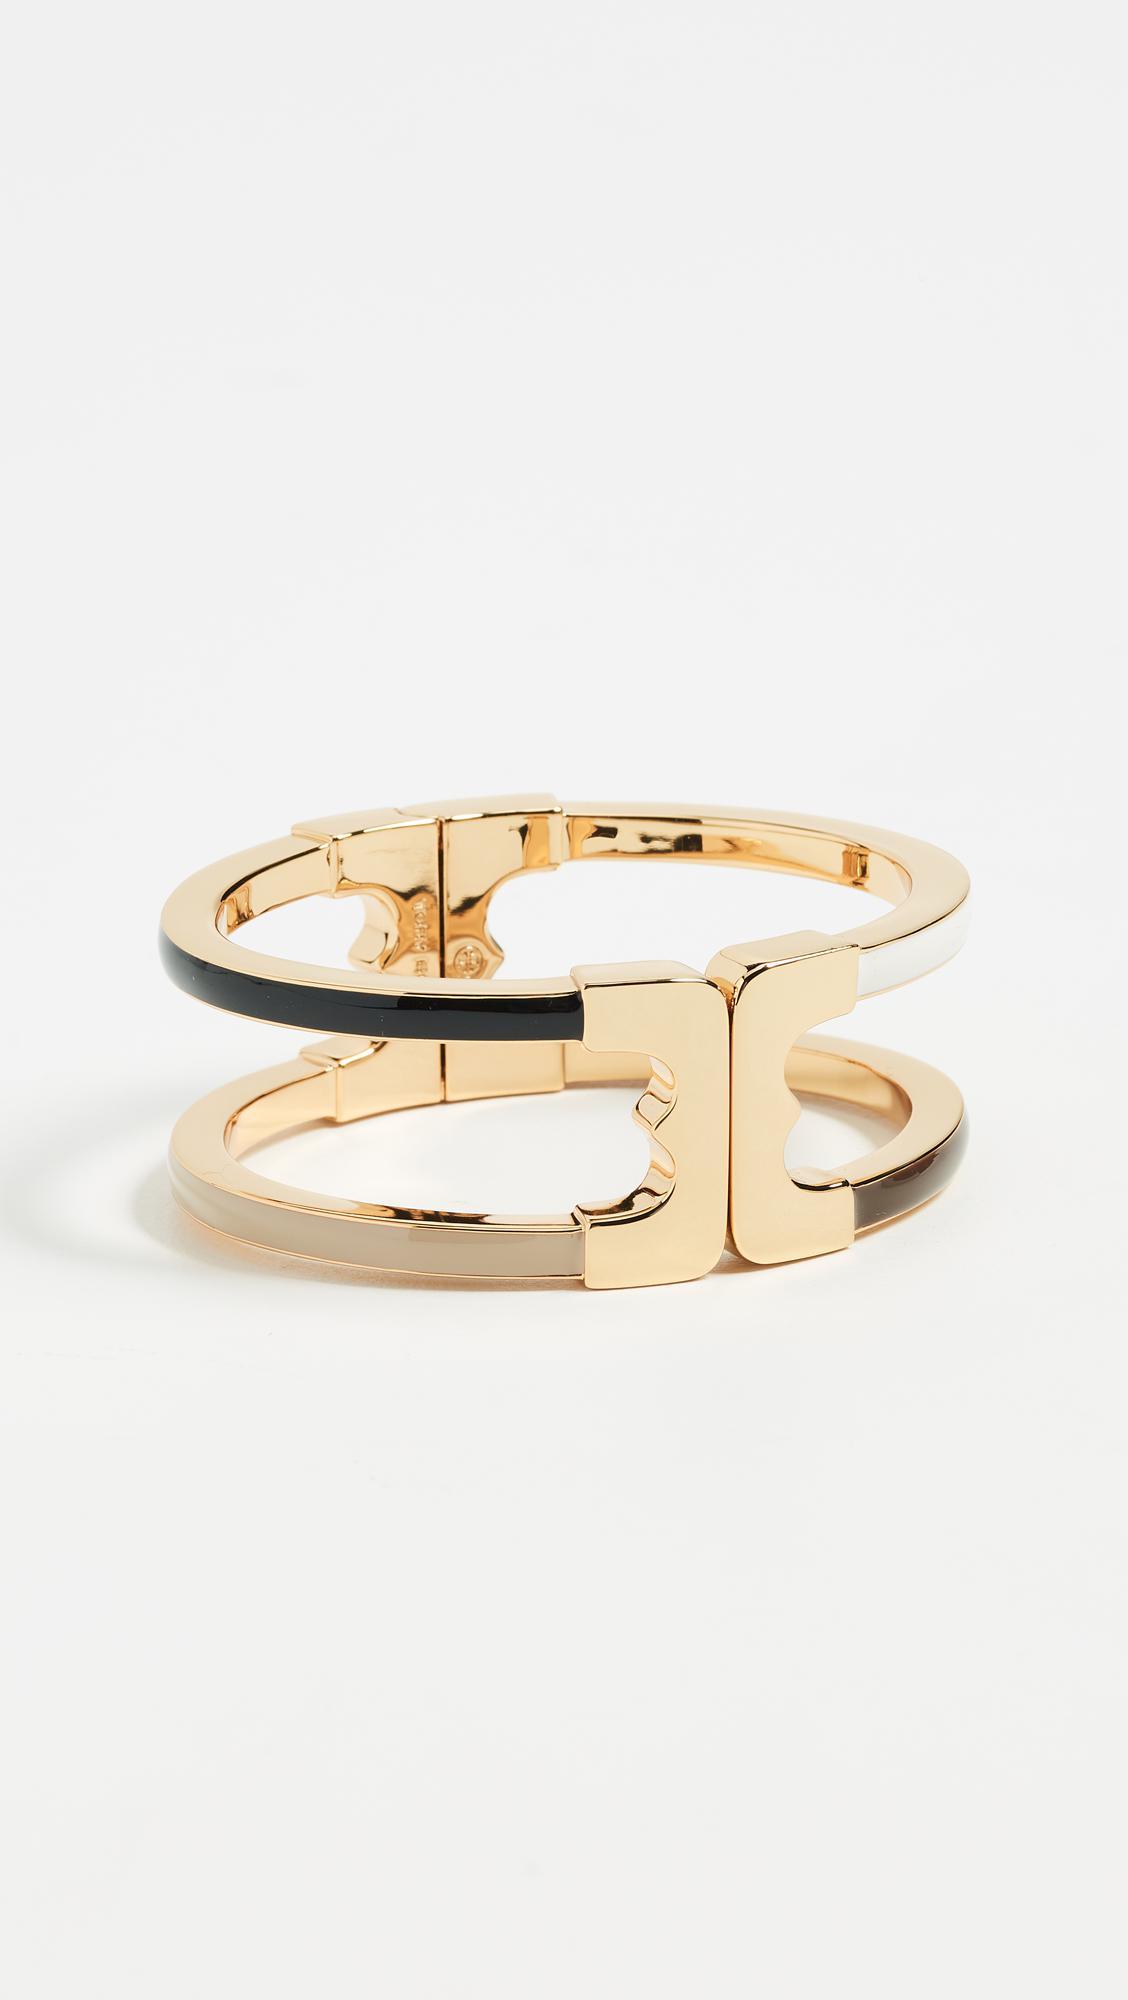 Tory Burch black enamel bracelet - Metallic Q4bGGbkRw